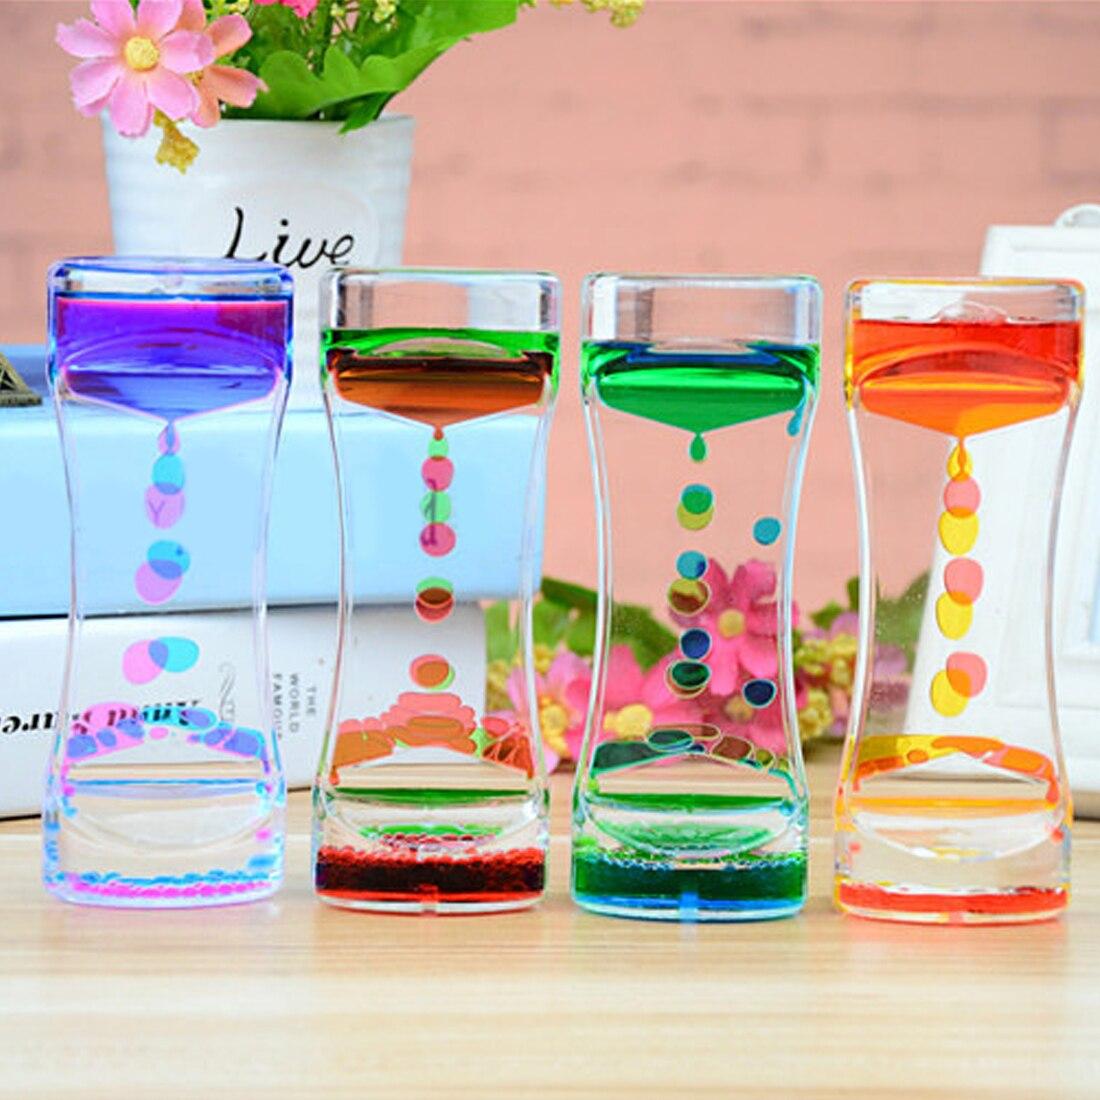 Floating Color Mix Illusion Timer Liquid Motion Visual Slim liquid Oil Glass Acrylic Hourglass Timer Clock Ornament Desk